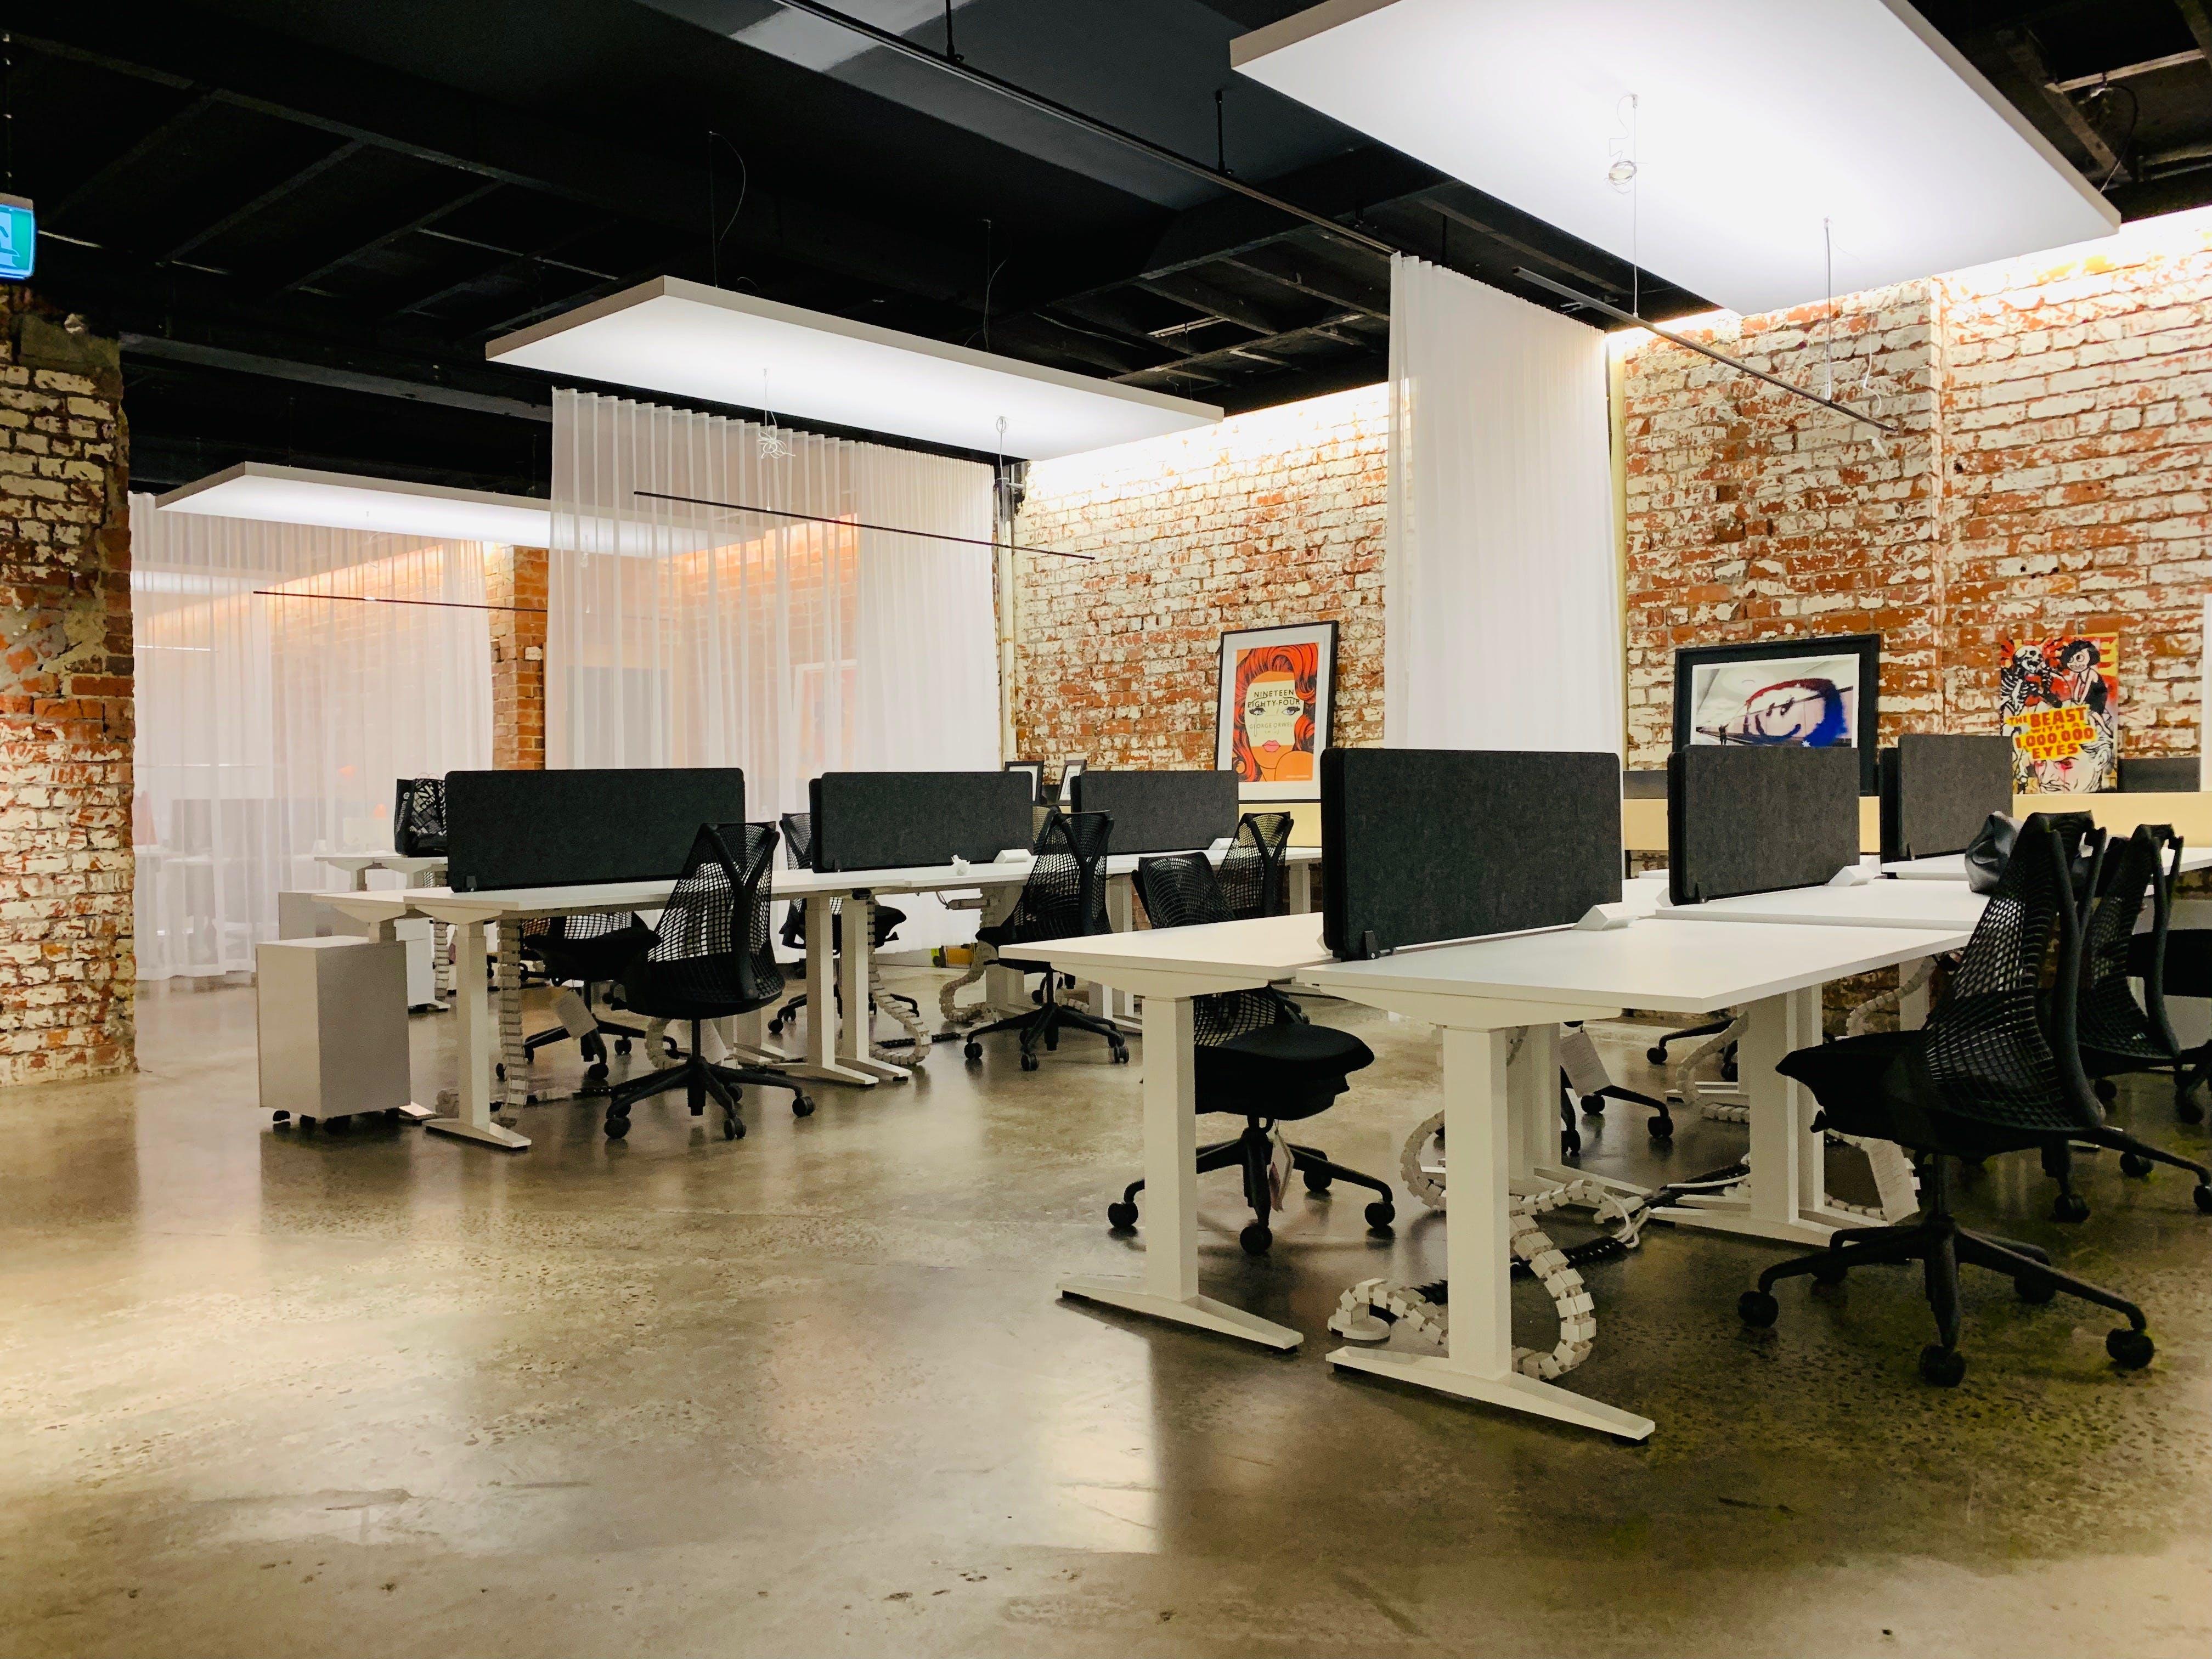 Gallery, hot desk at Revolver Lane, image 1